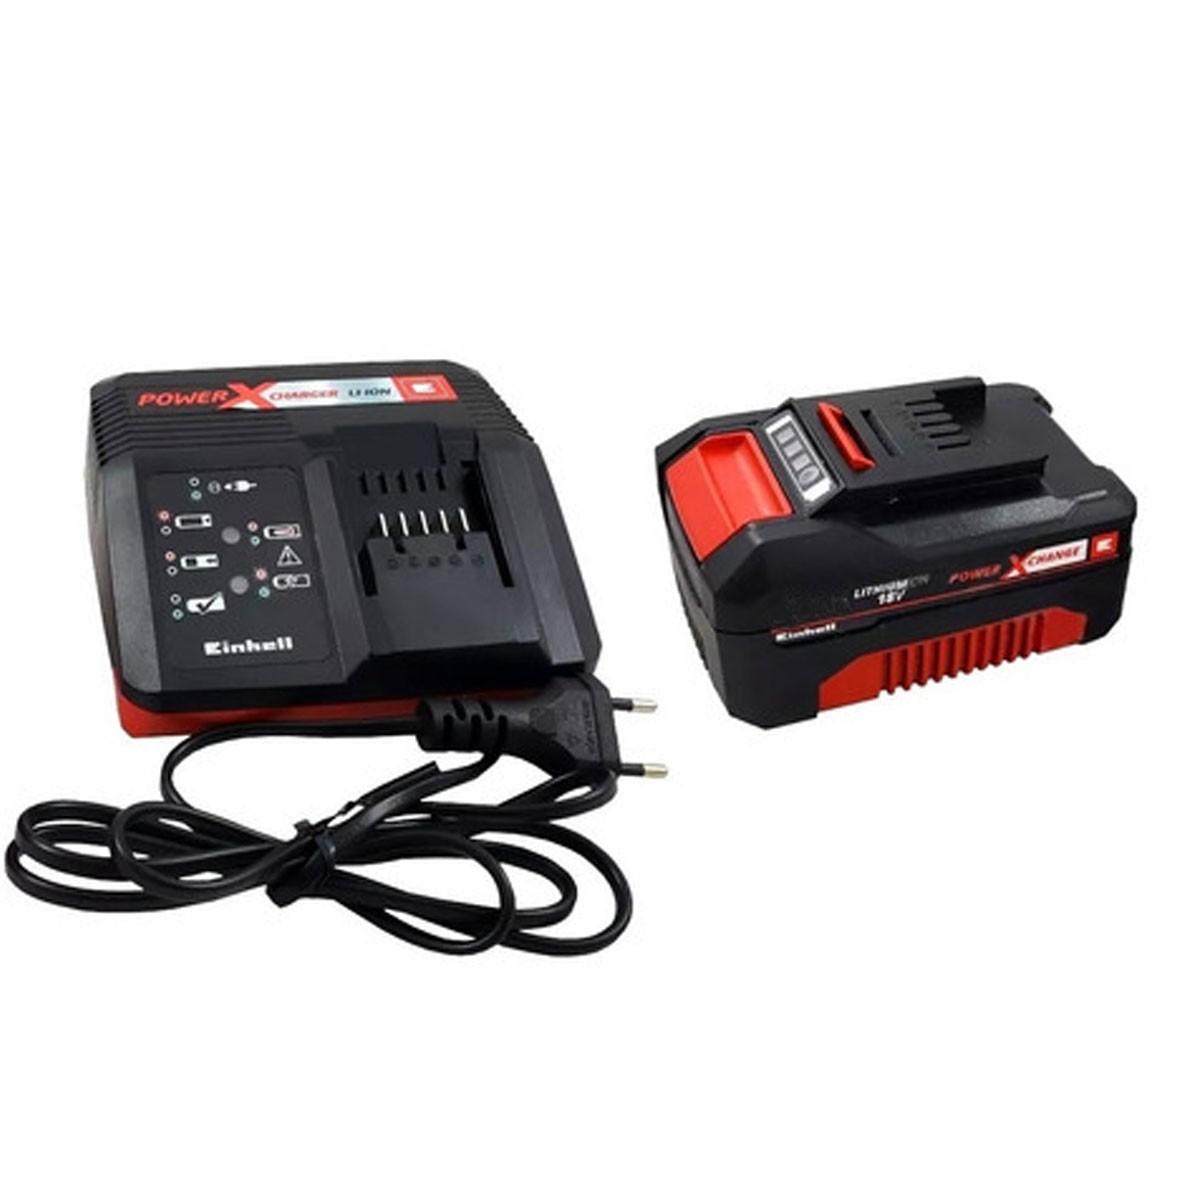 Kit Carregador Einhell Power X-Change Bivolt Com Bateria 18V 4.0Ah